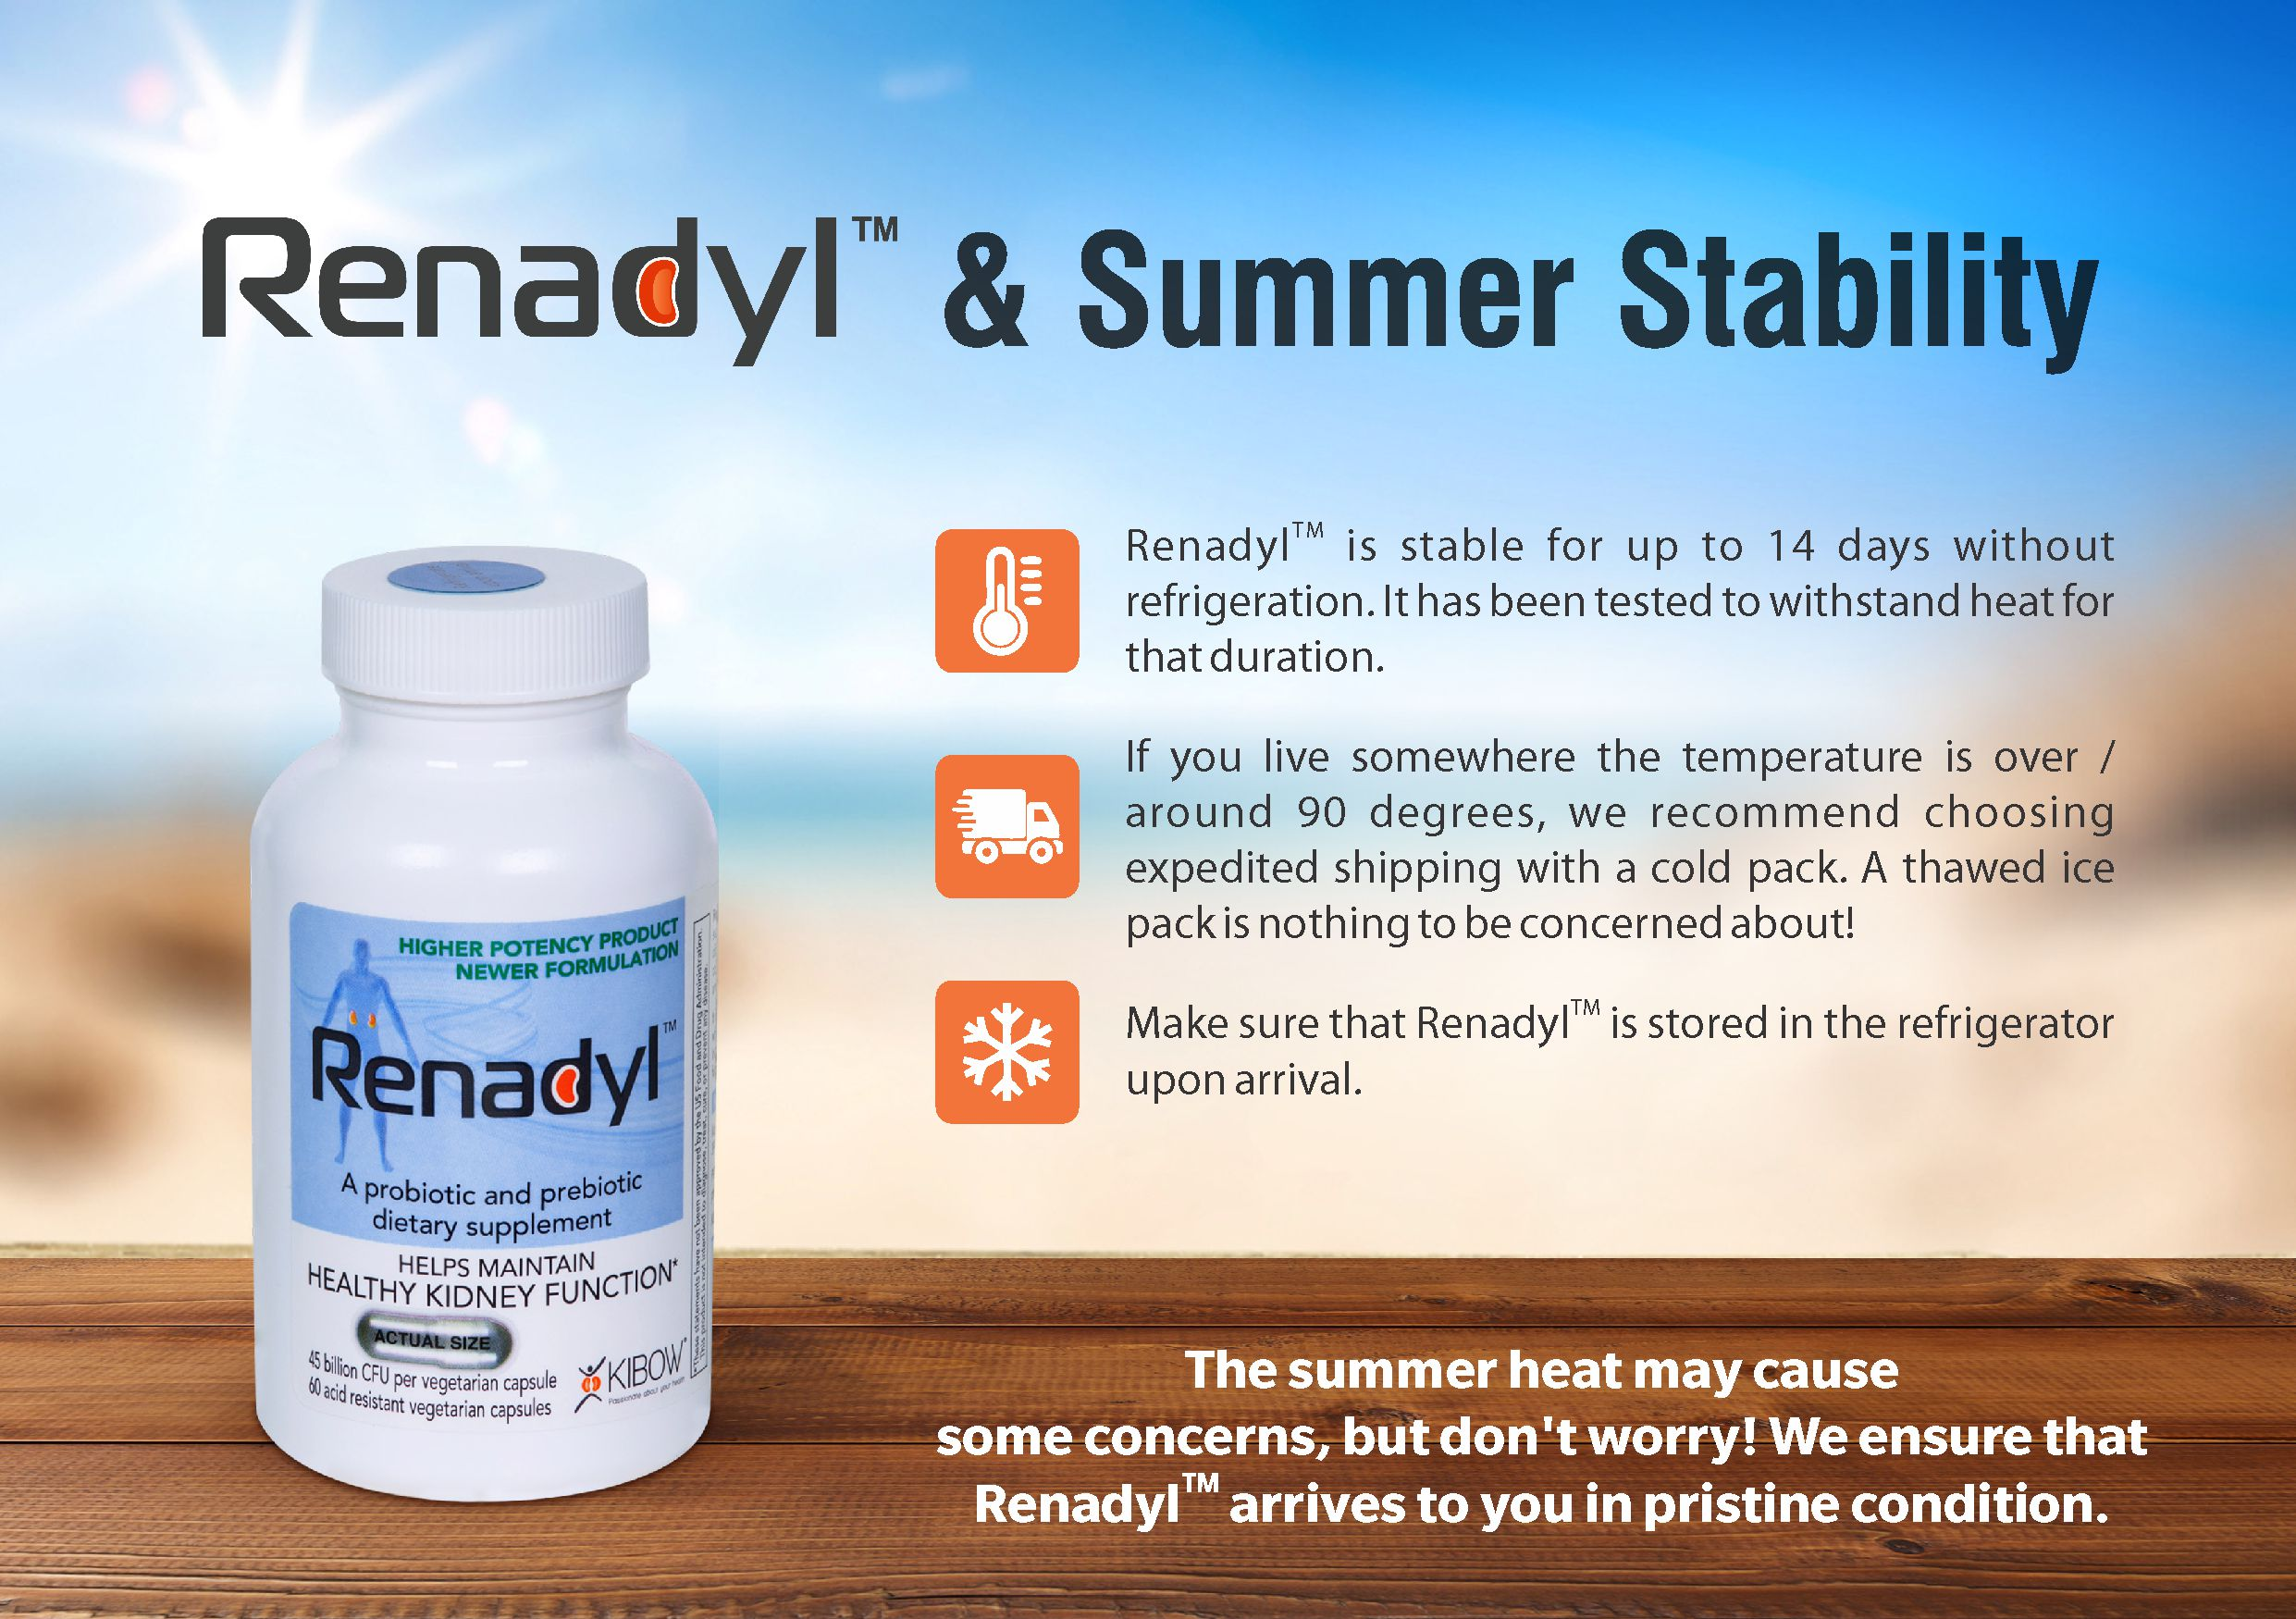 renadyl-summer-stability.jpg